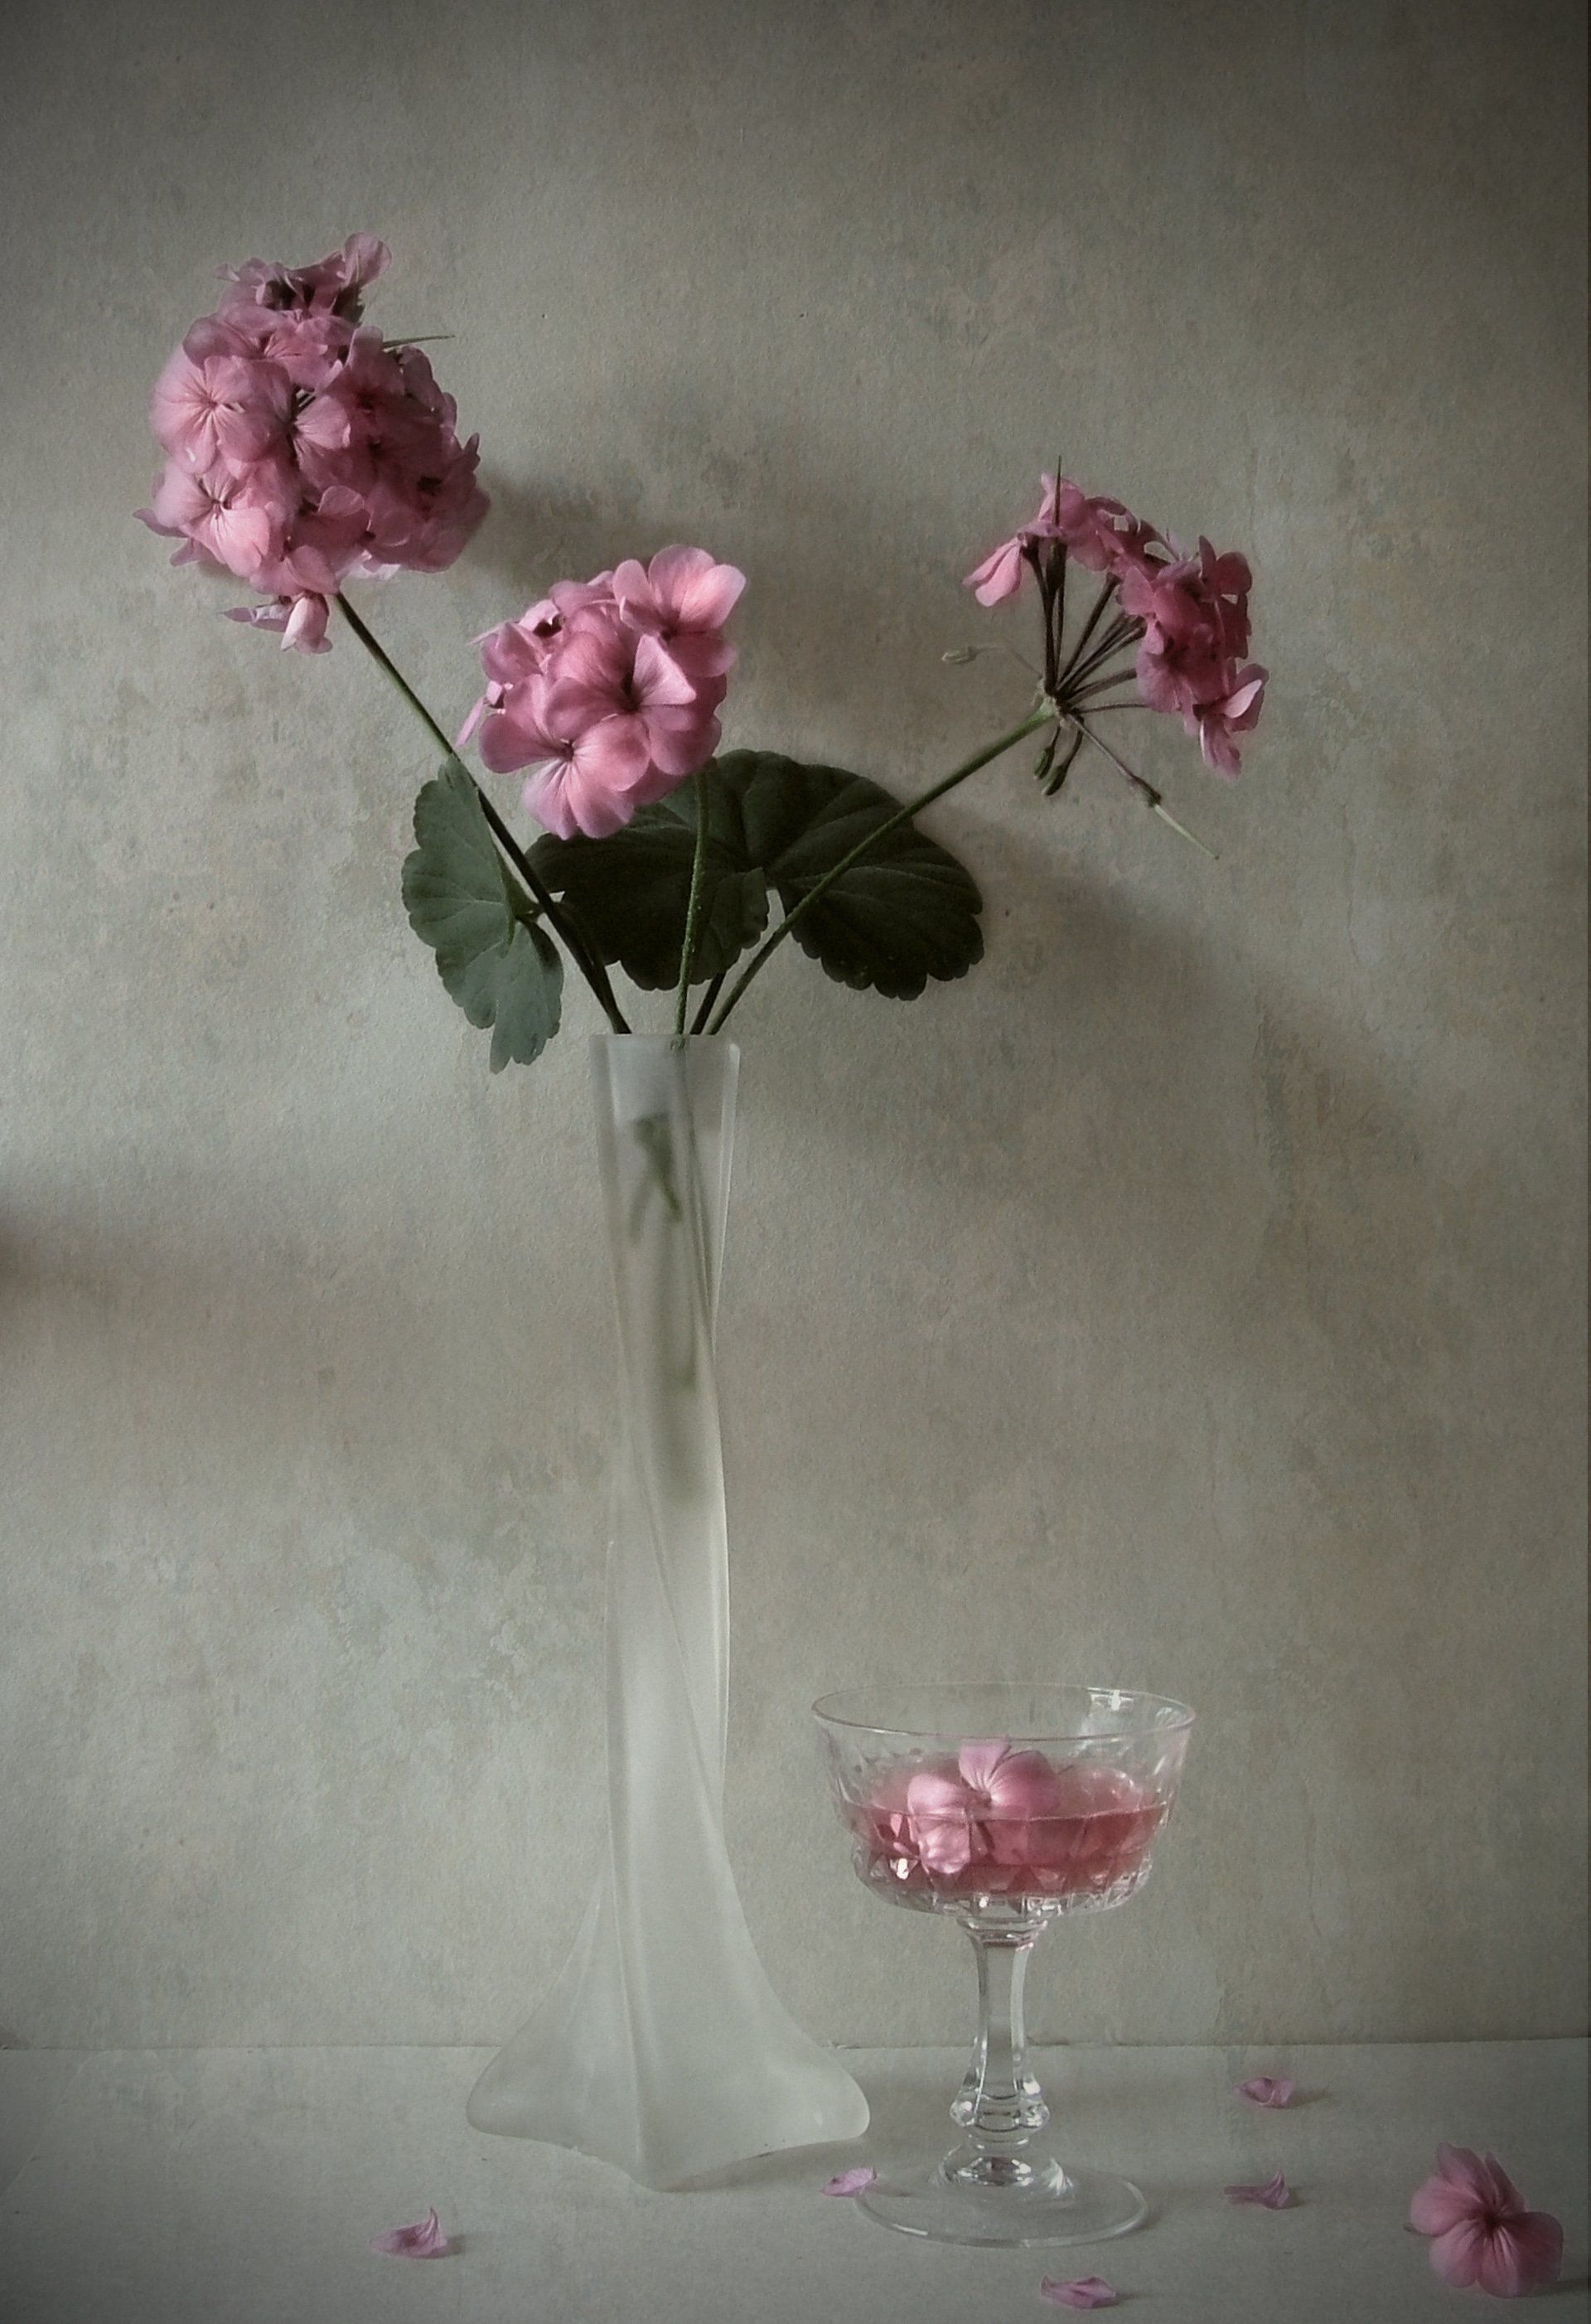 Geranium, wine, vase, flowers, Andrei Blank